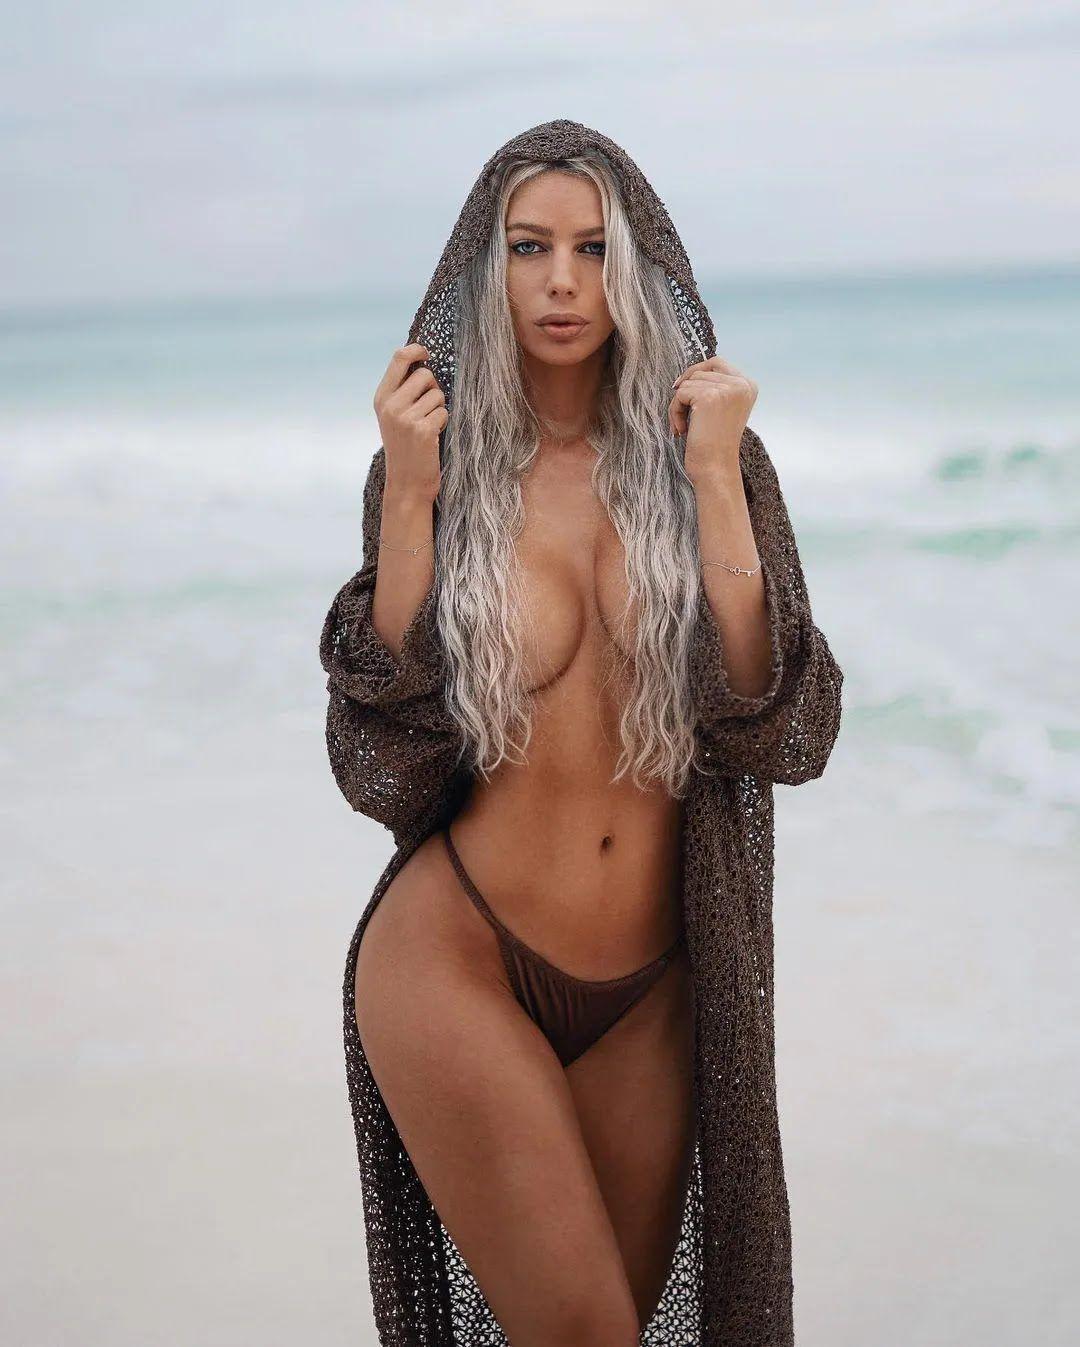 Янита Янчева прикрыла грудь волосами